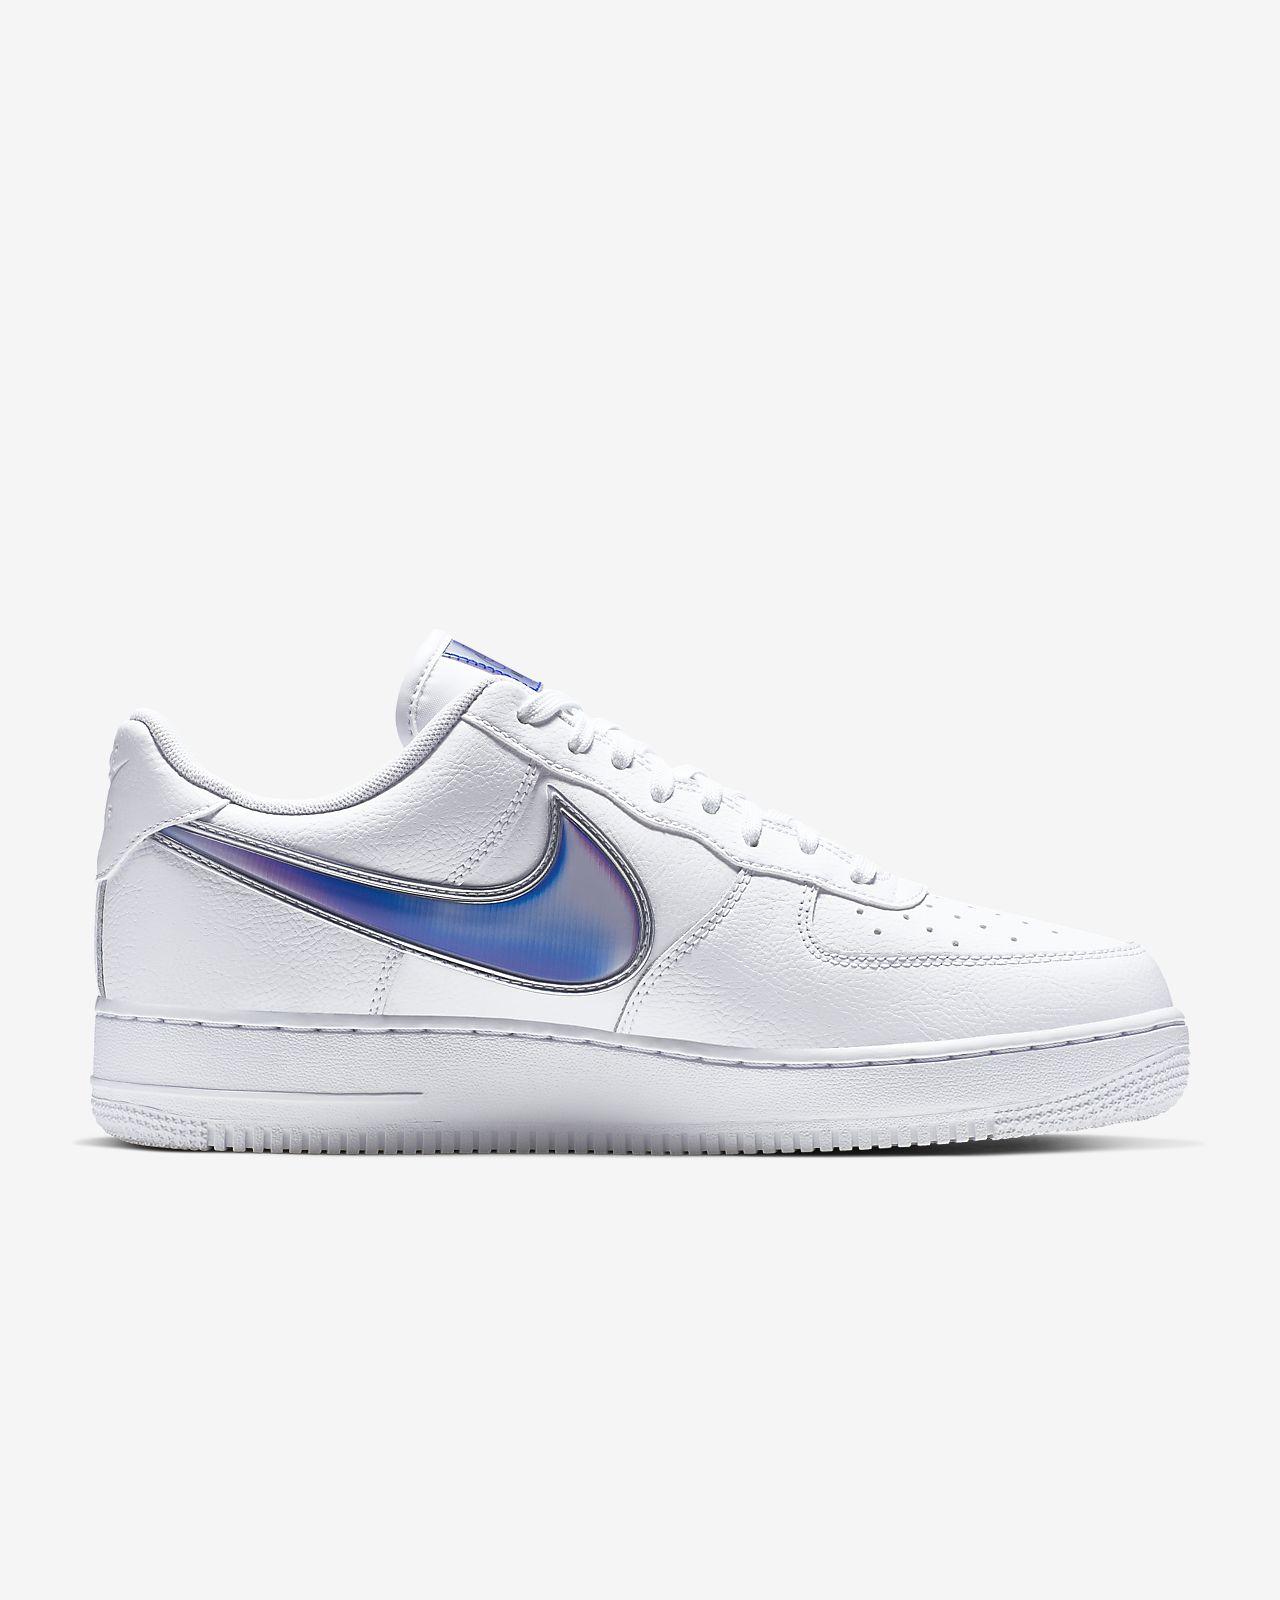 Nike Air Force 1 '07 LV8 3 Sneaker (Men) | Nordstrom